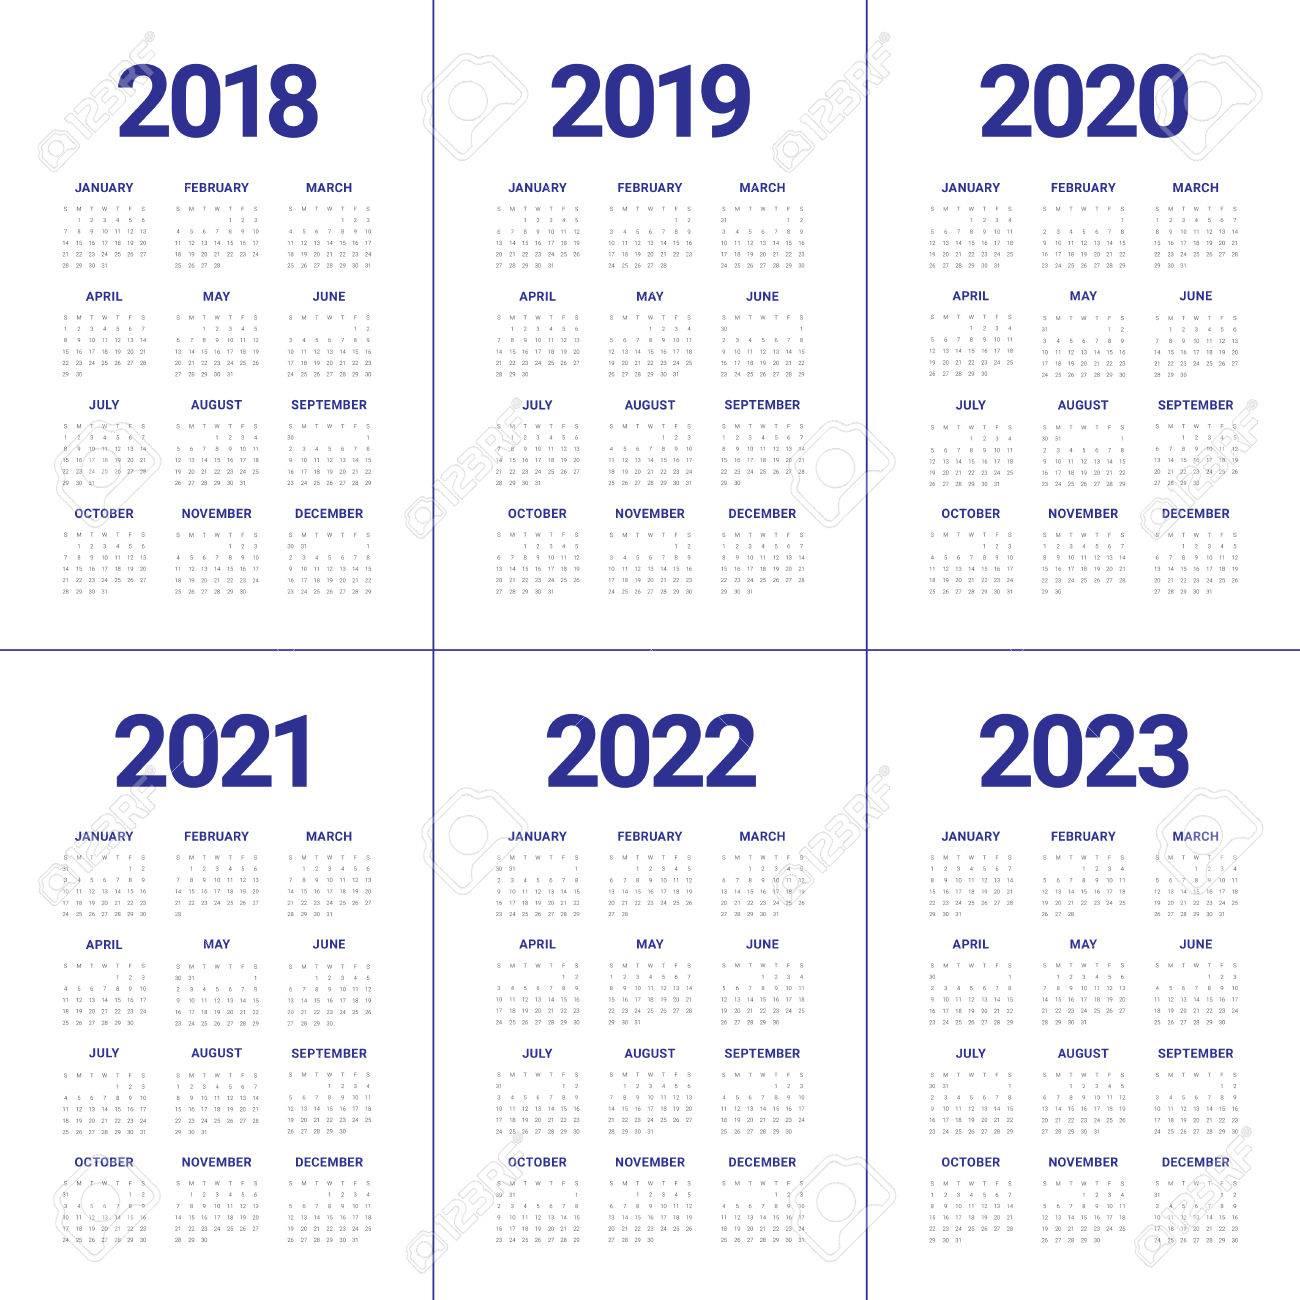 2018 Calendrier 2022 Year 2018 2019 2020 2021 2022 2023 Calendar Vector Design Template